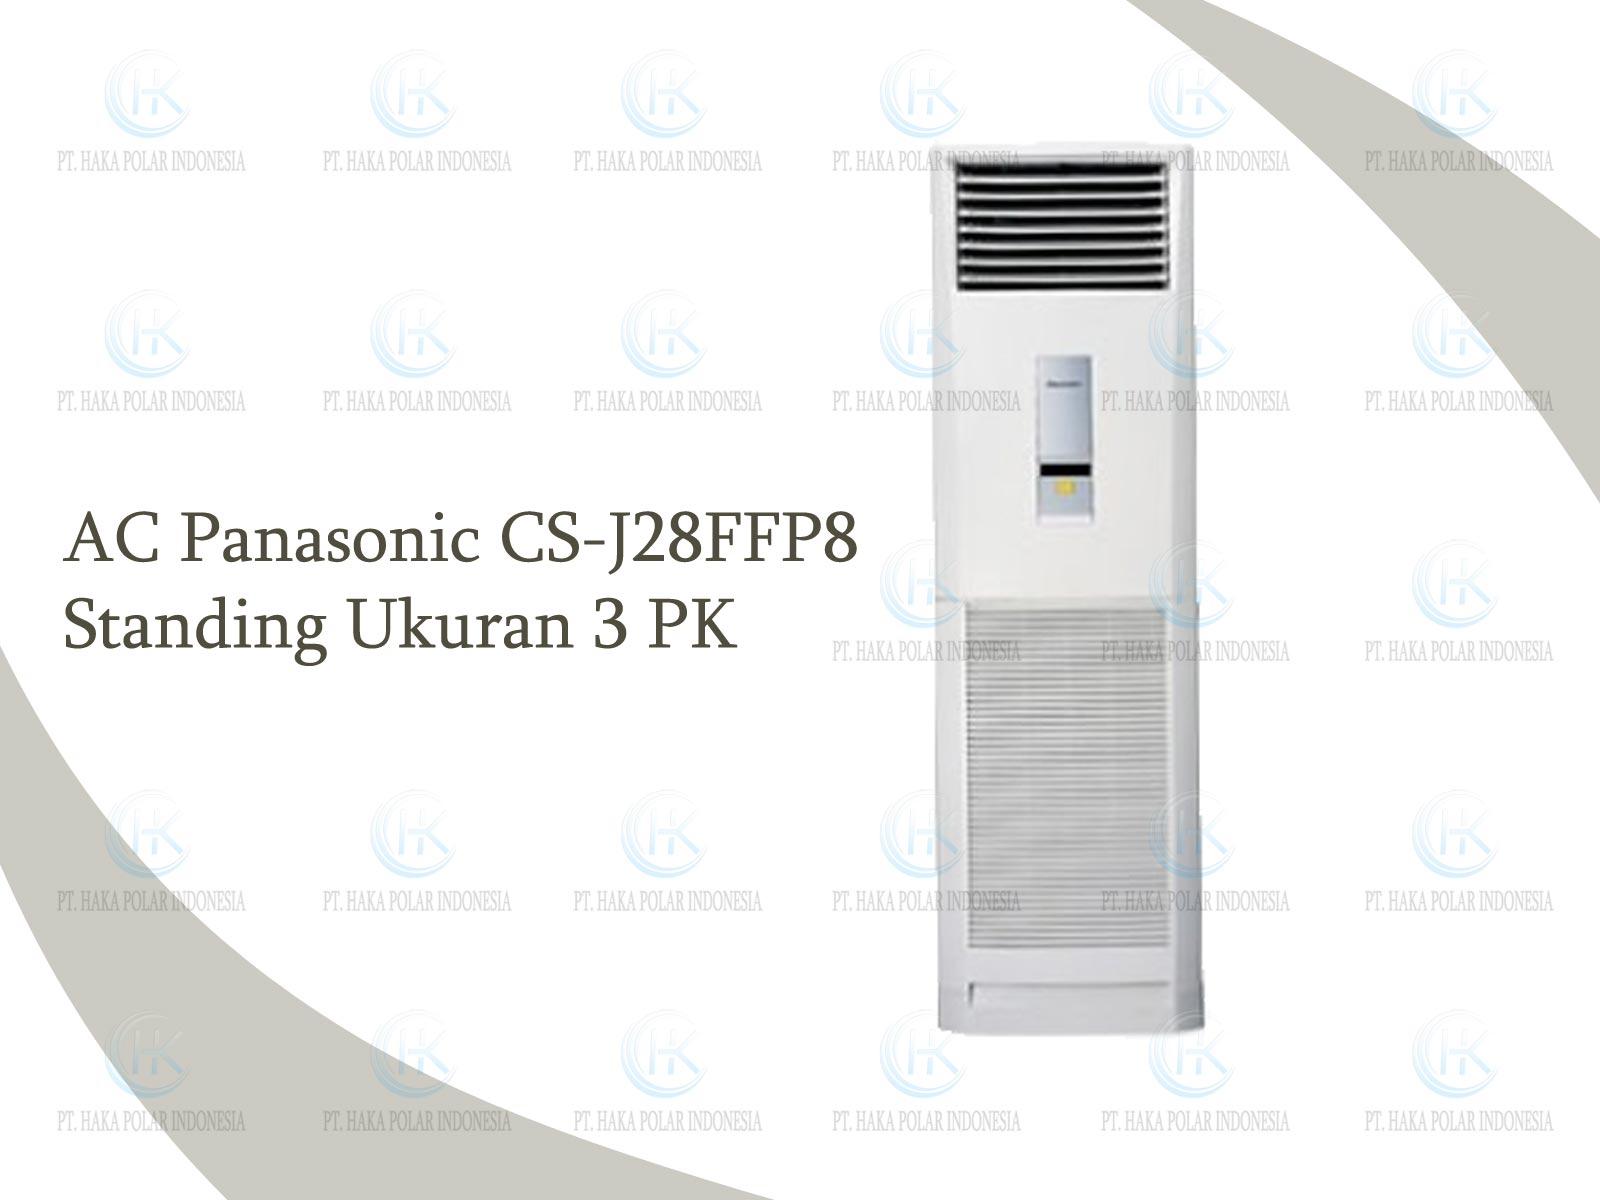 Jual AC Panasonic CS-J28FFP8 3 PK Floor Standing R410a